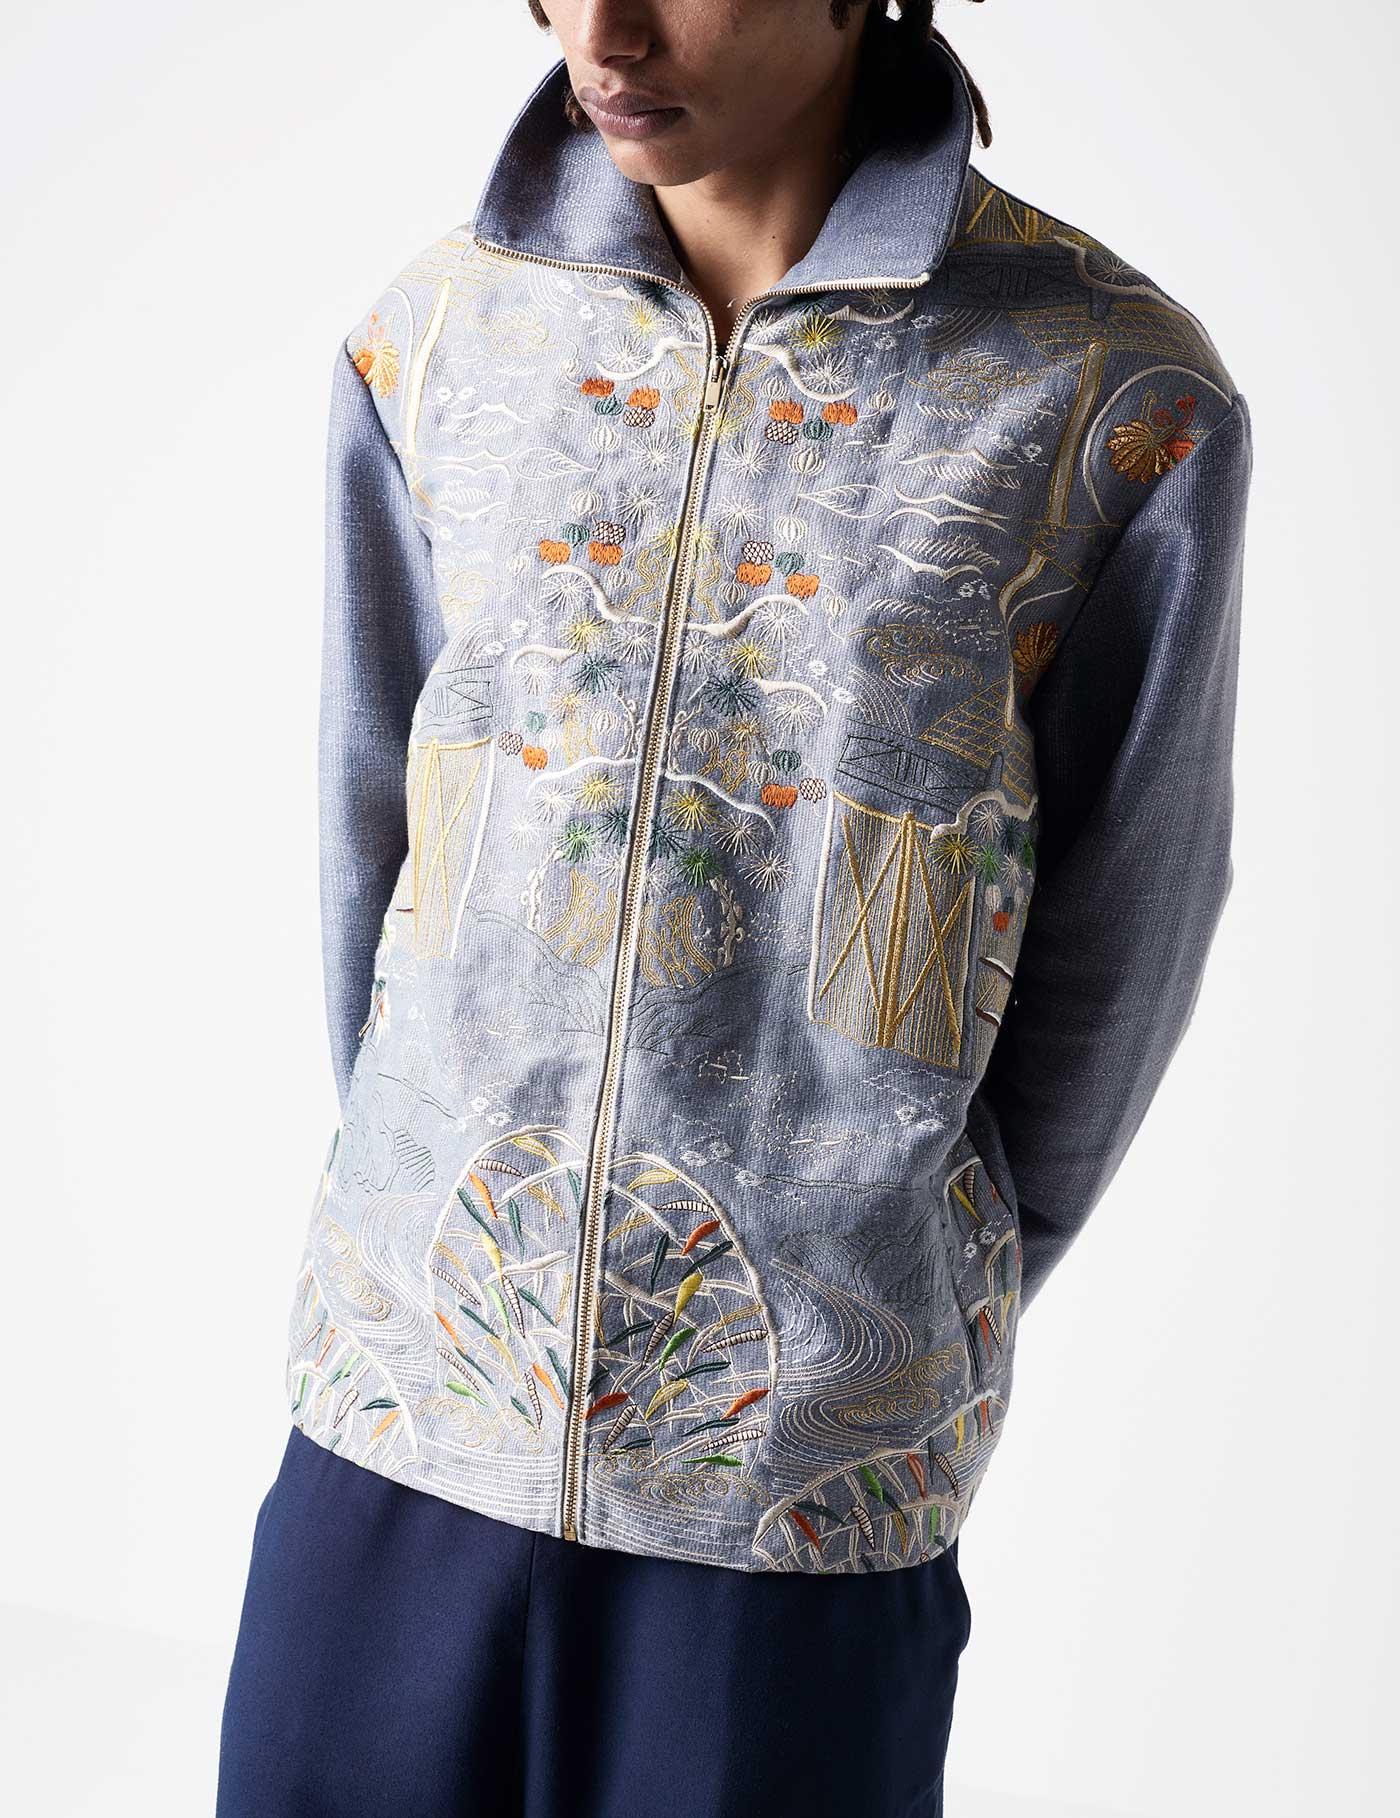 Hemp, Organic Silk and Organic Cotton Natural Dyed and